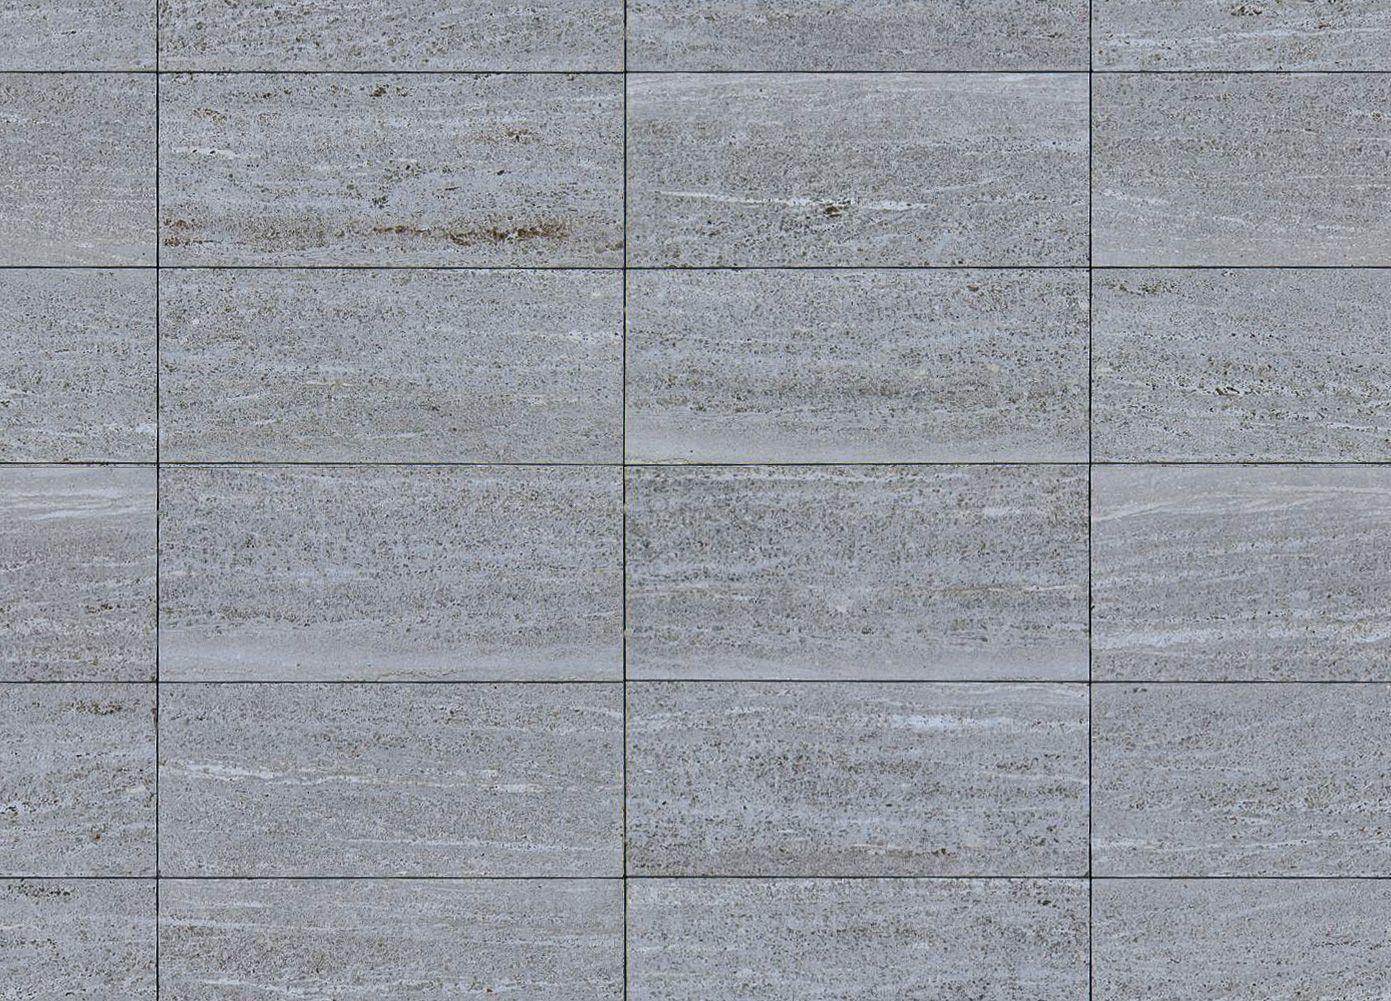 Stone cladding capstone stone cladding texture cladding